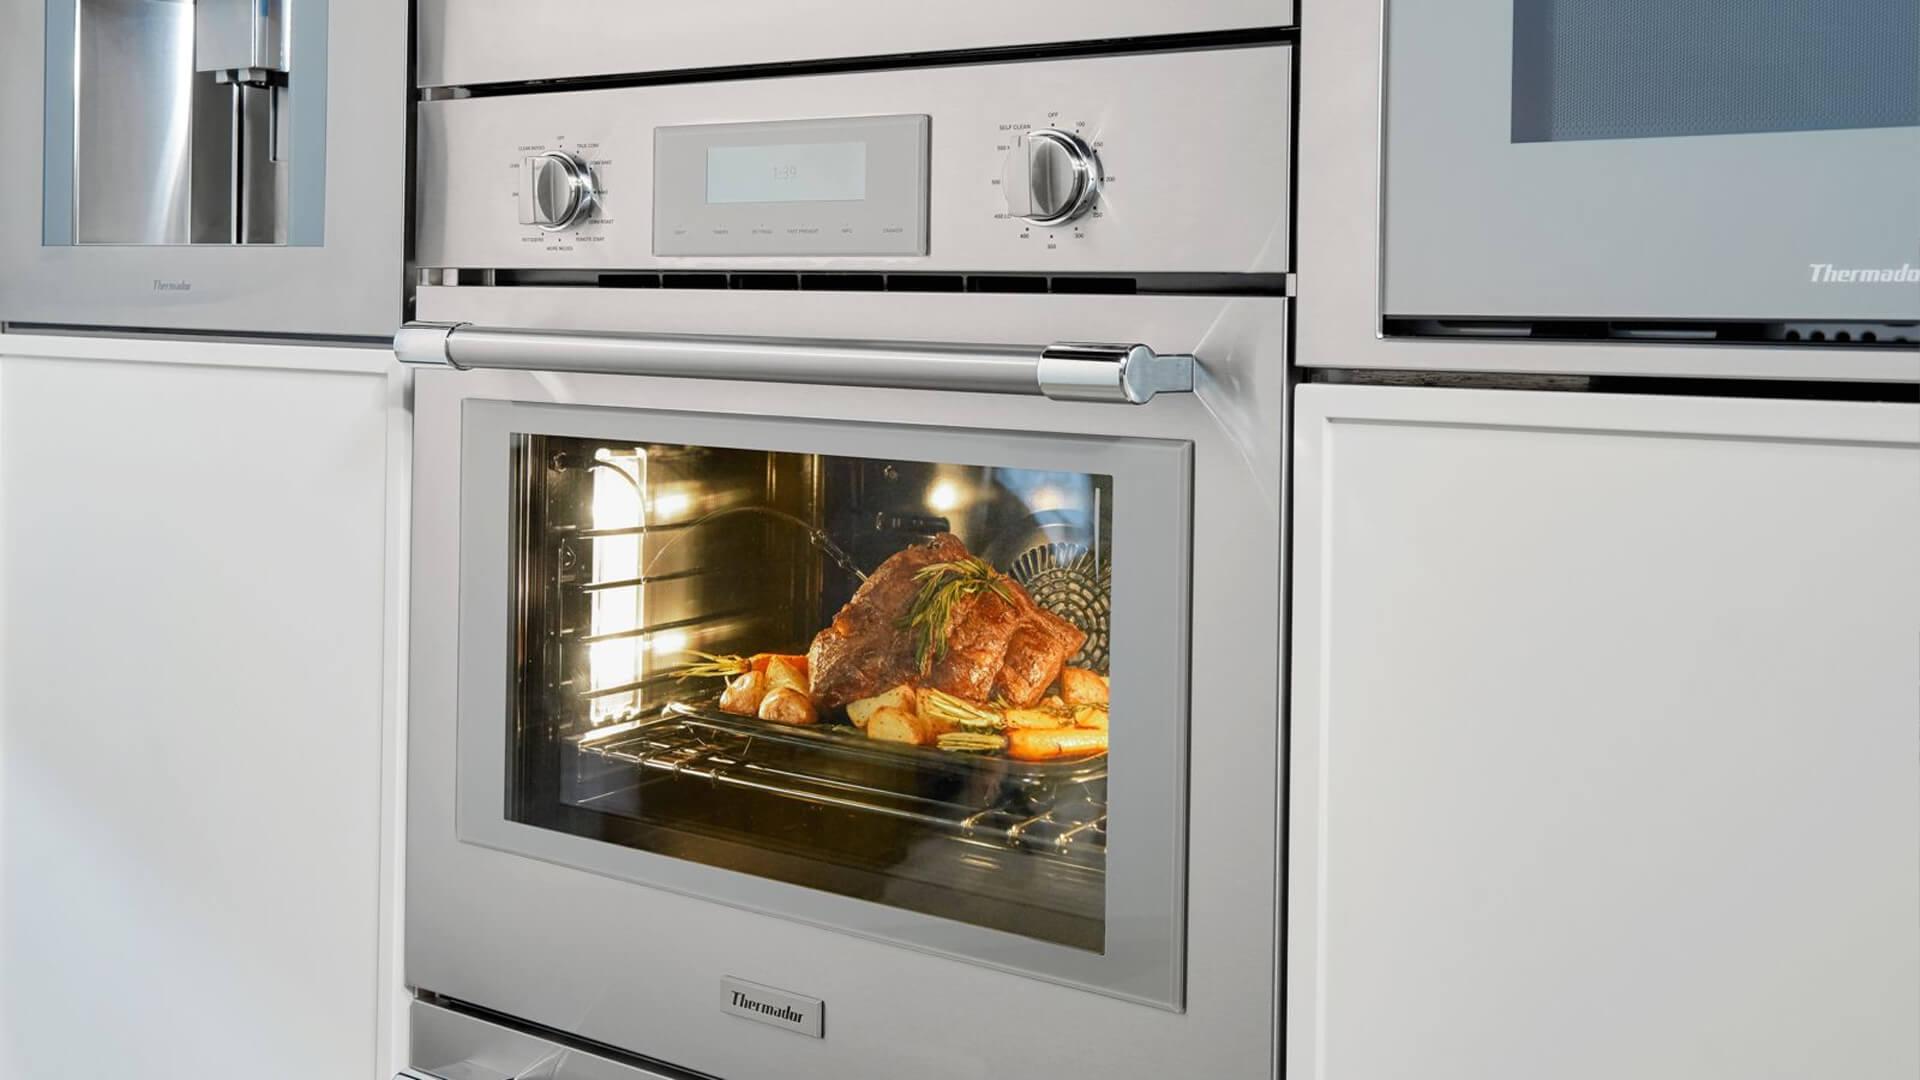 Thermador Wall Oven Repair | Thermador Appliance Repair Pros